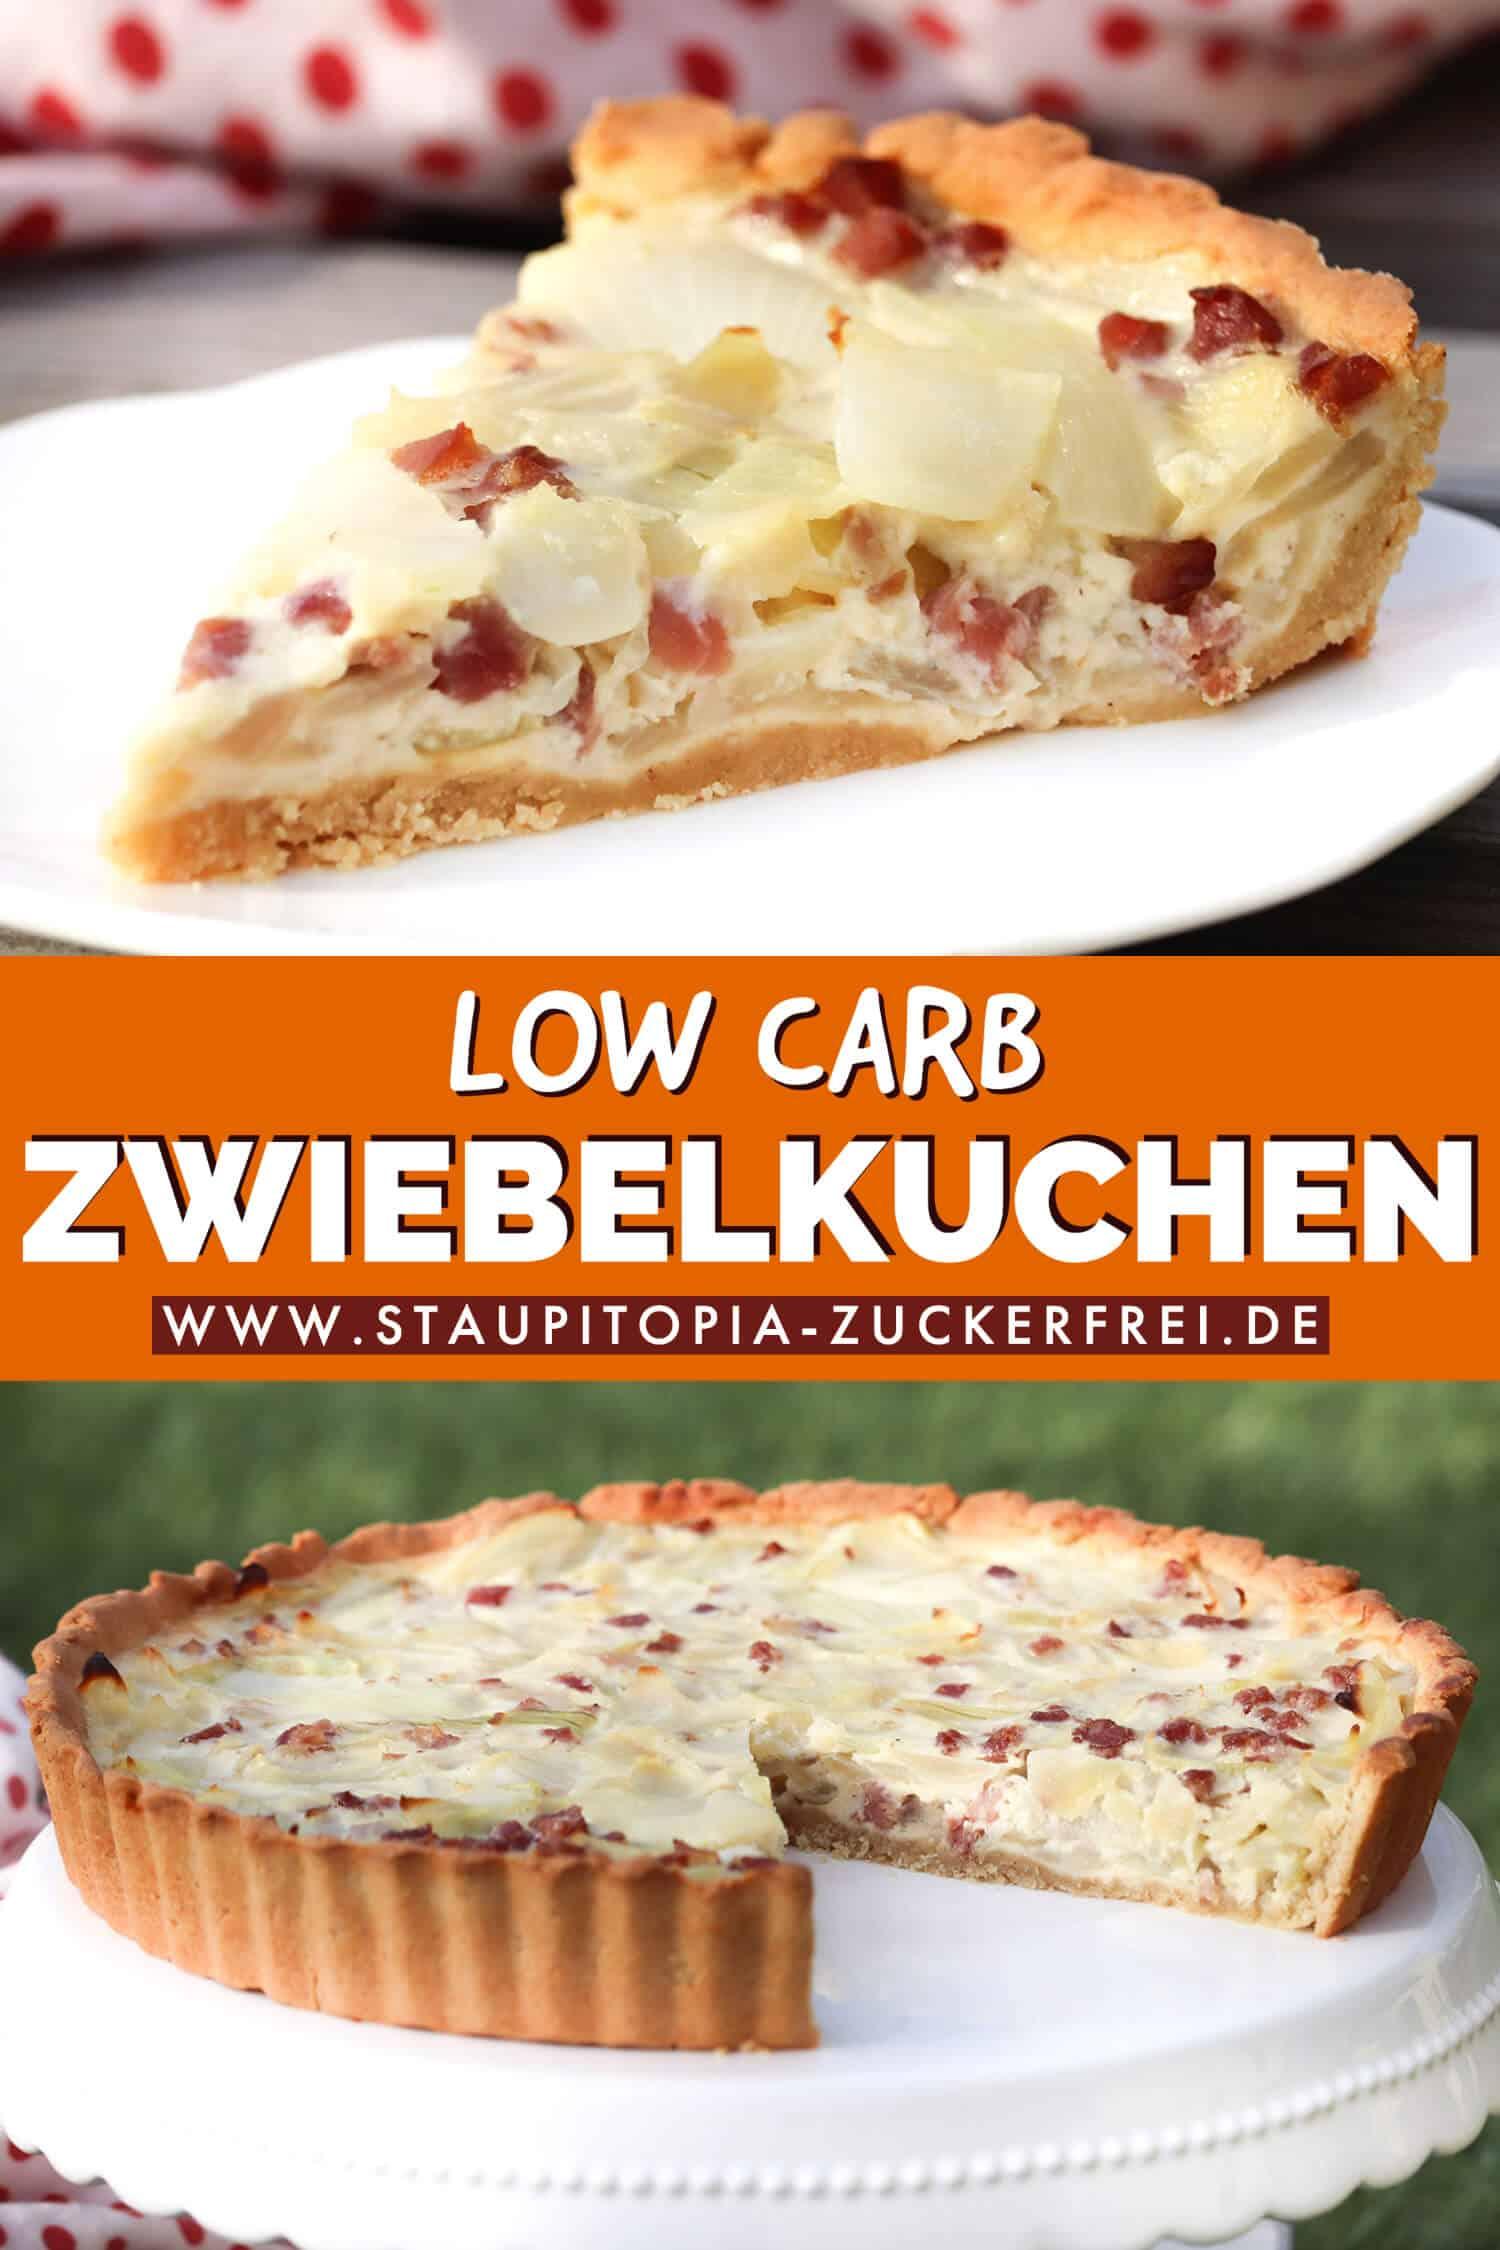 Low Carb Zwiebelkuchen ohne Kohlenhydrate Rezept